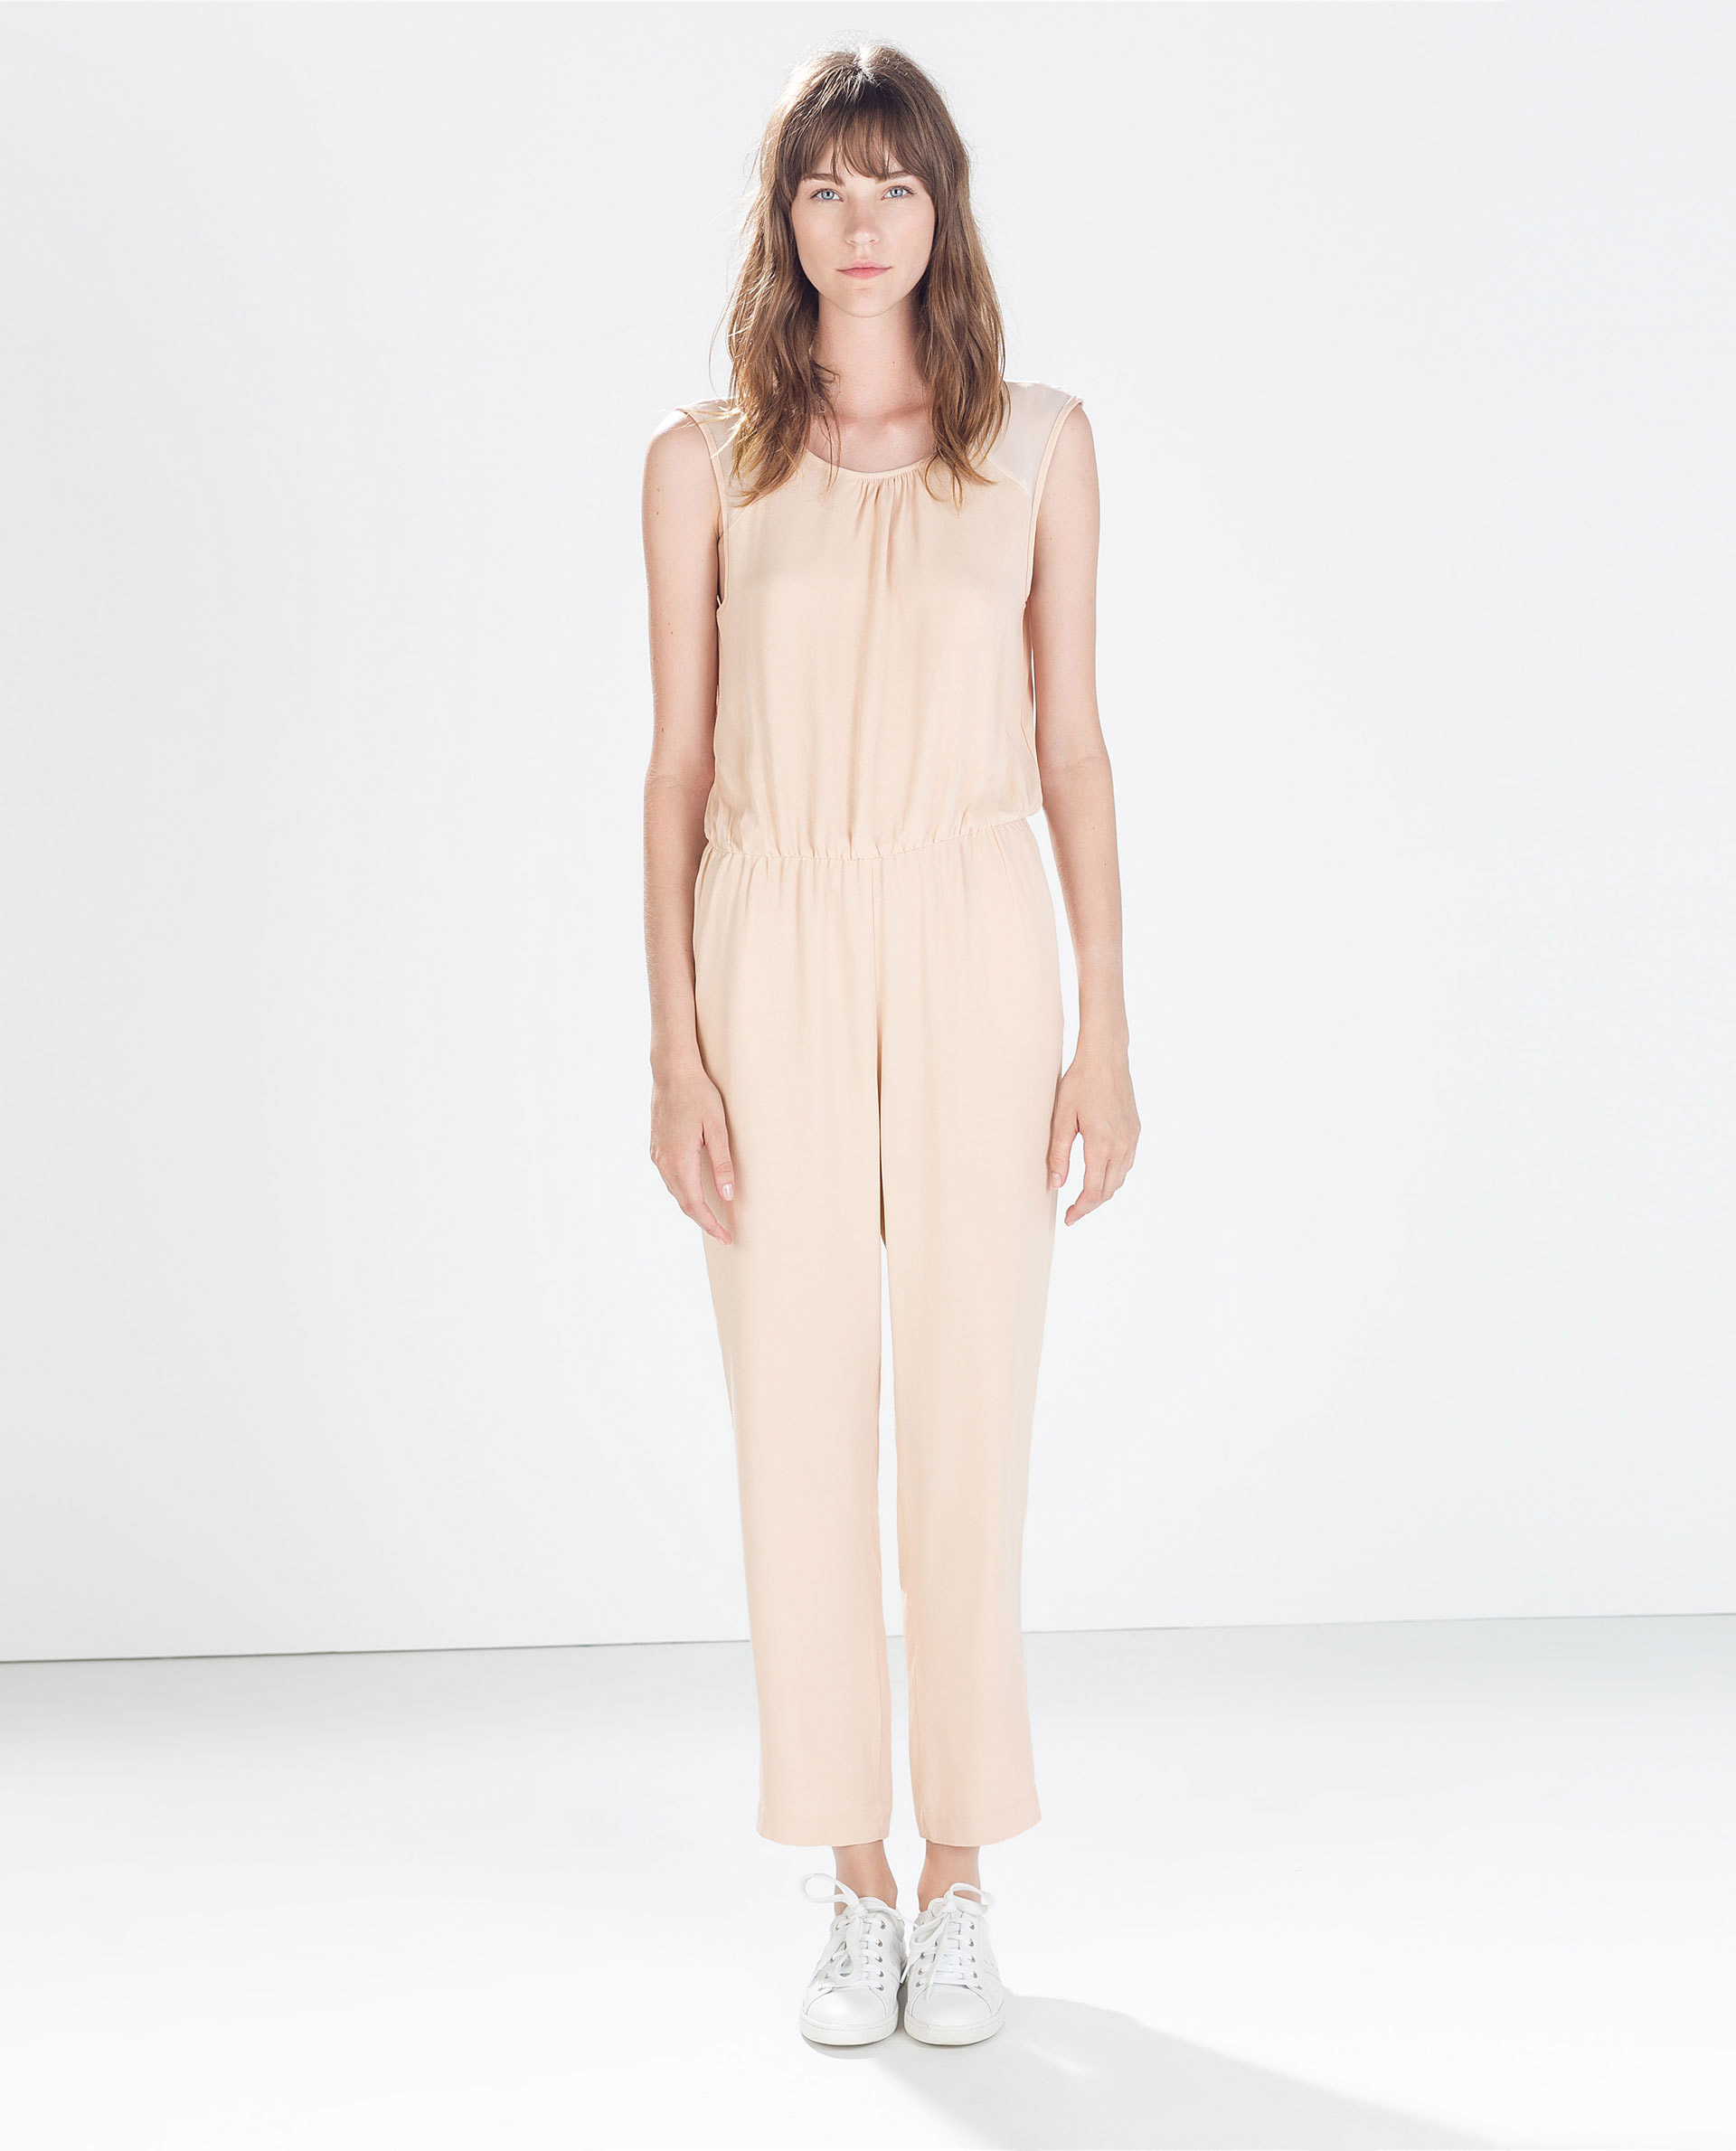 Zara - Combinaison longue parties transparentes (49,95 €)